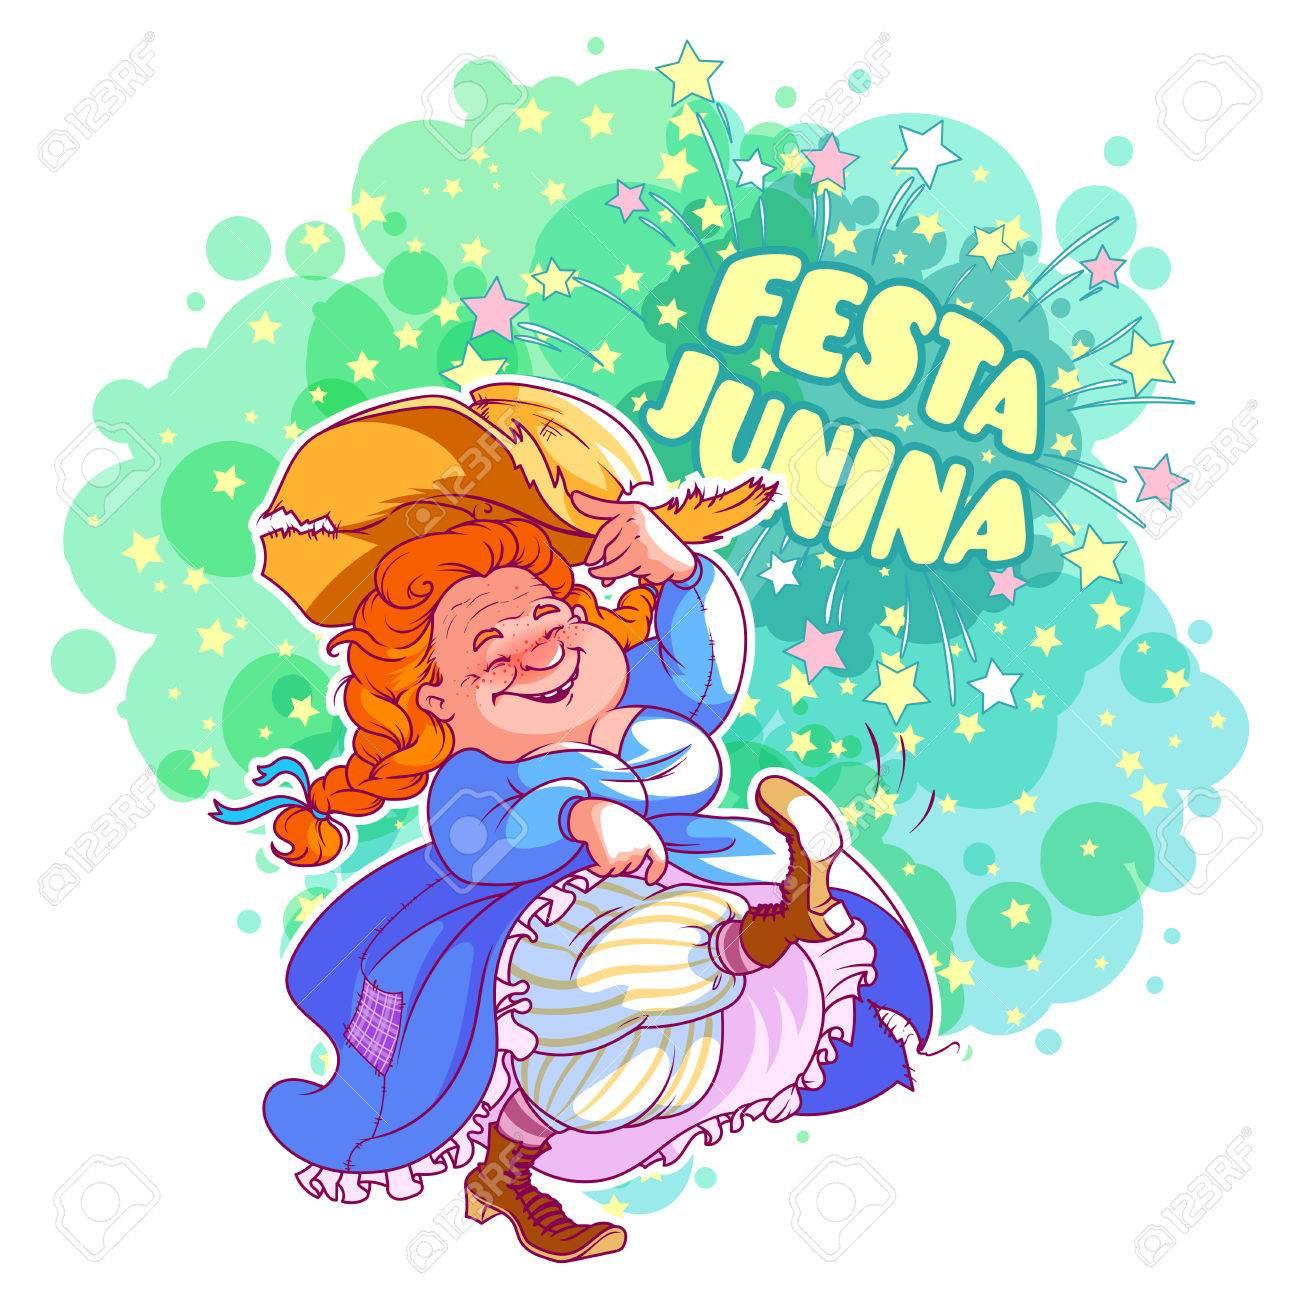 Greeting card for june festival in brazil dancing old lady in greeting card for june festival in brazil dancing old lady in blue dress vector m4hsunfo